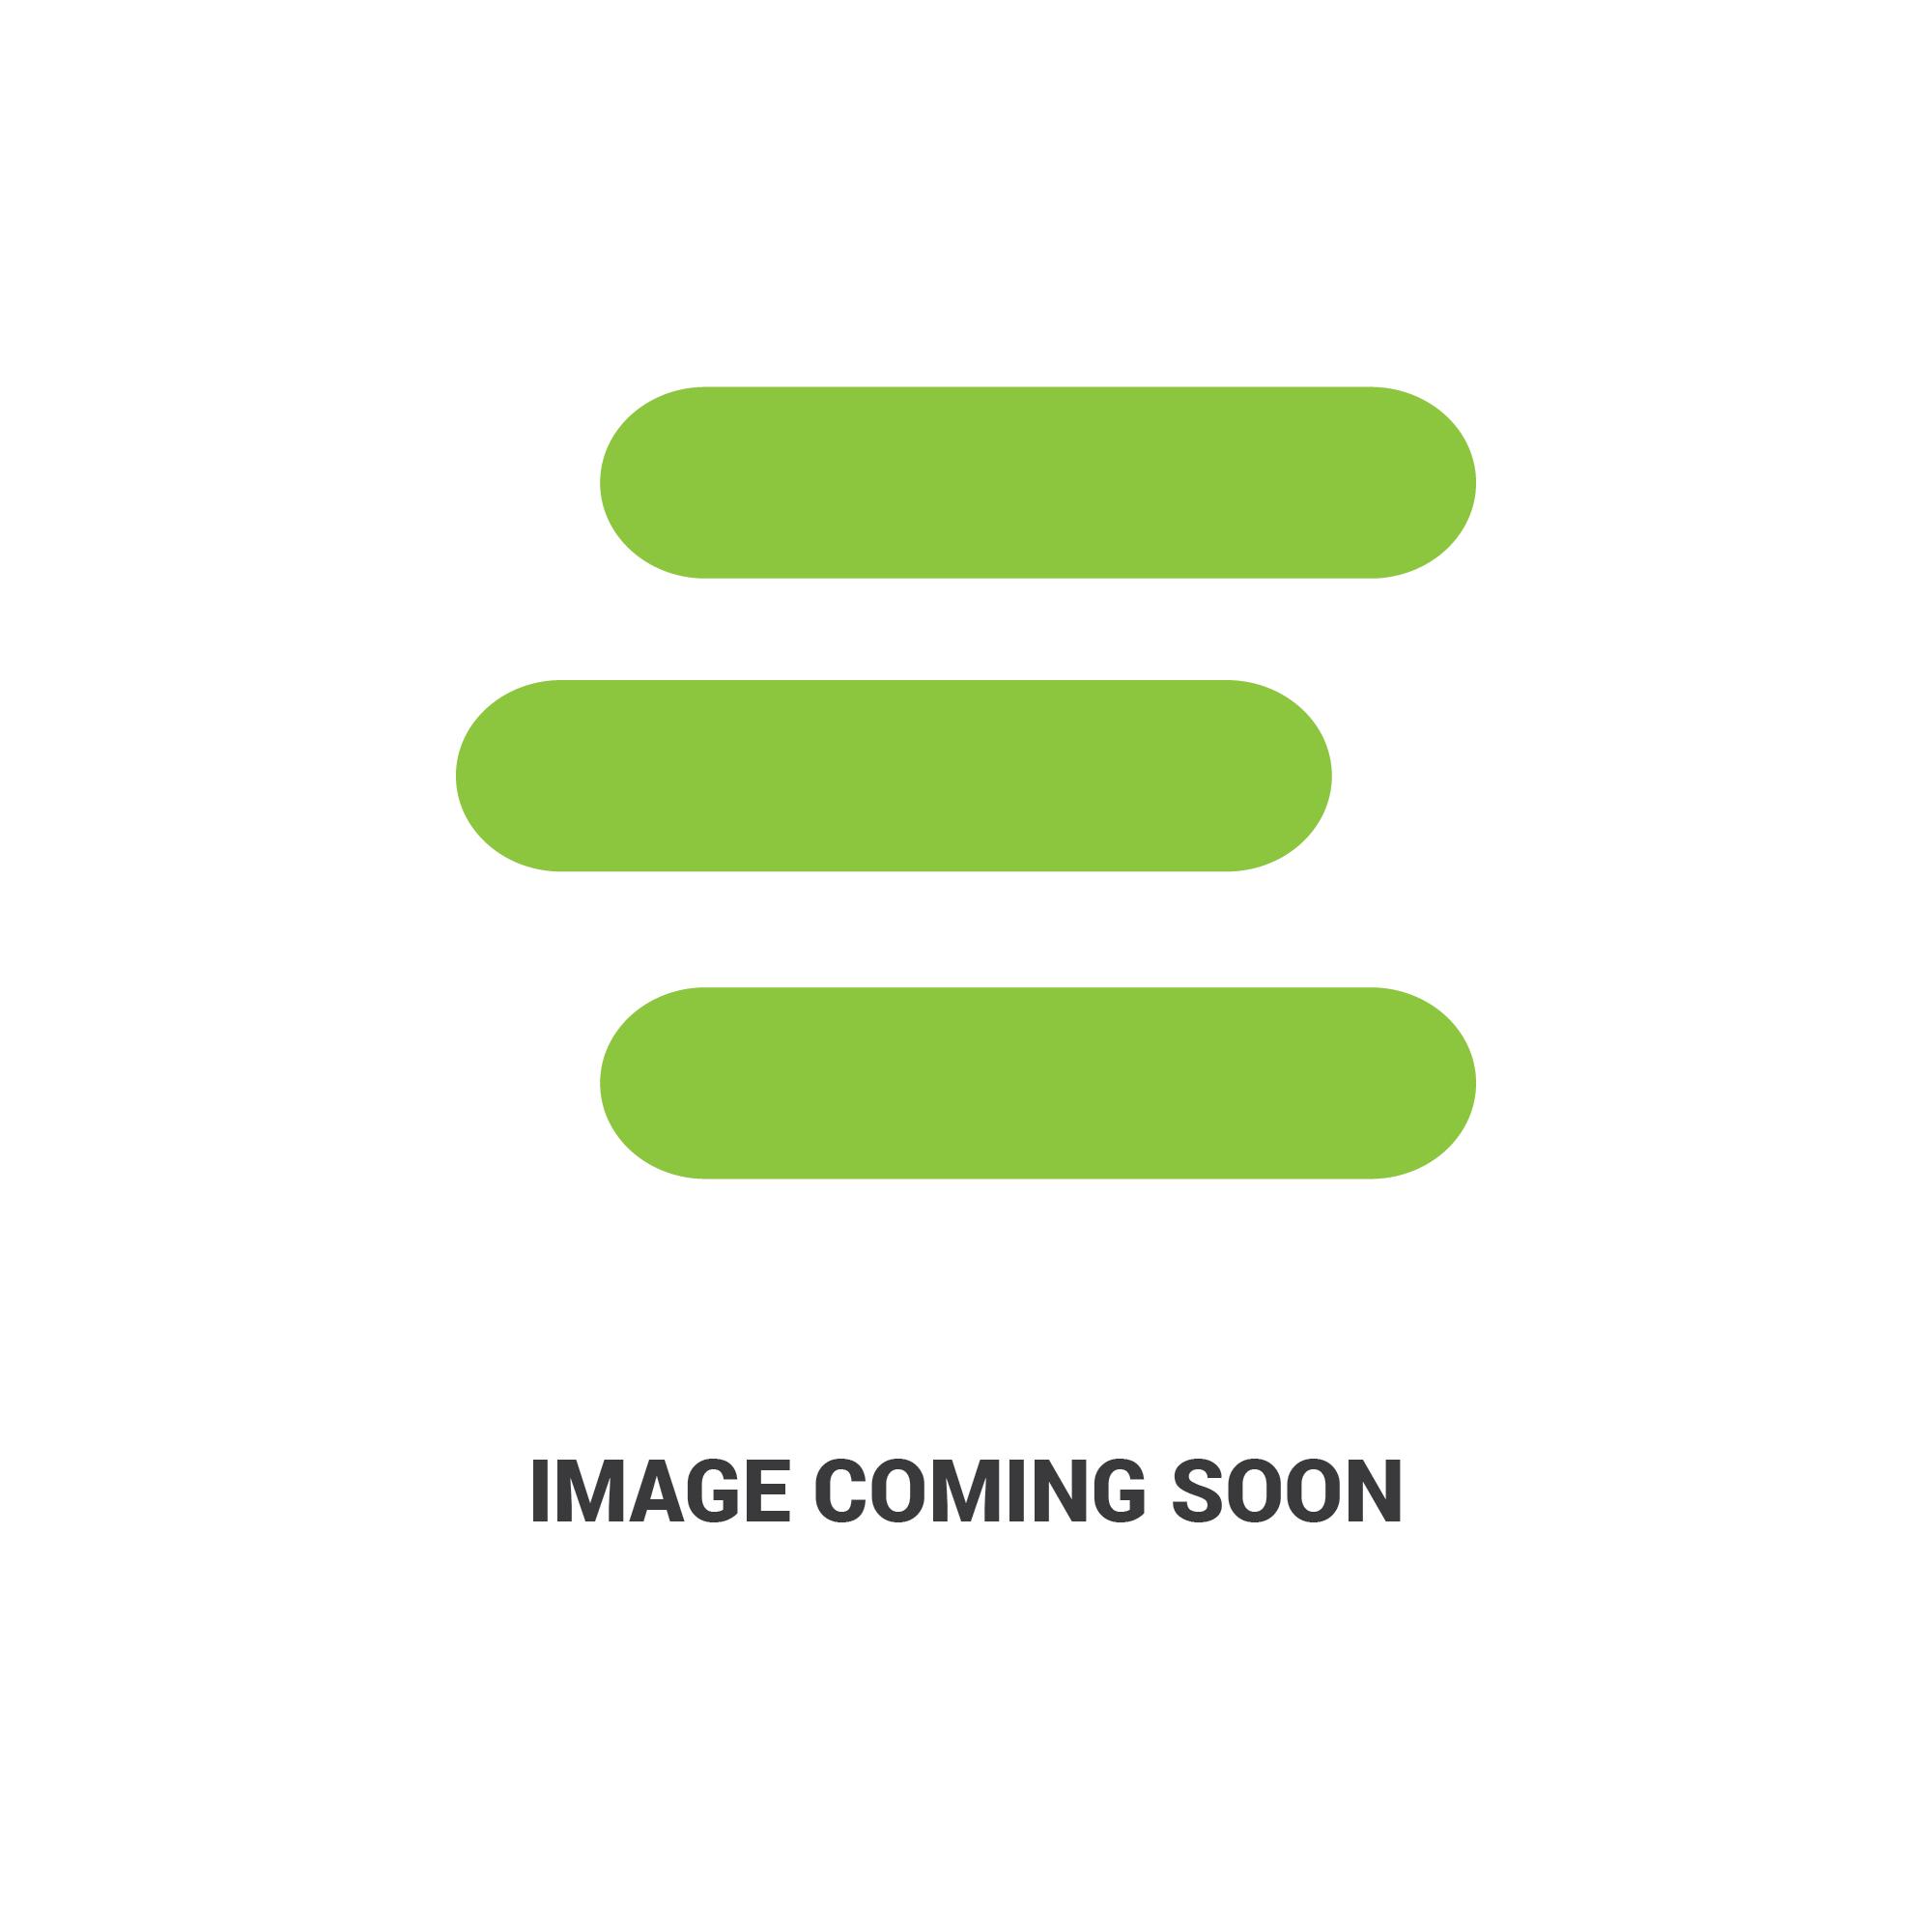 E-15241-32090edit 228.jpg